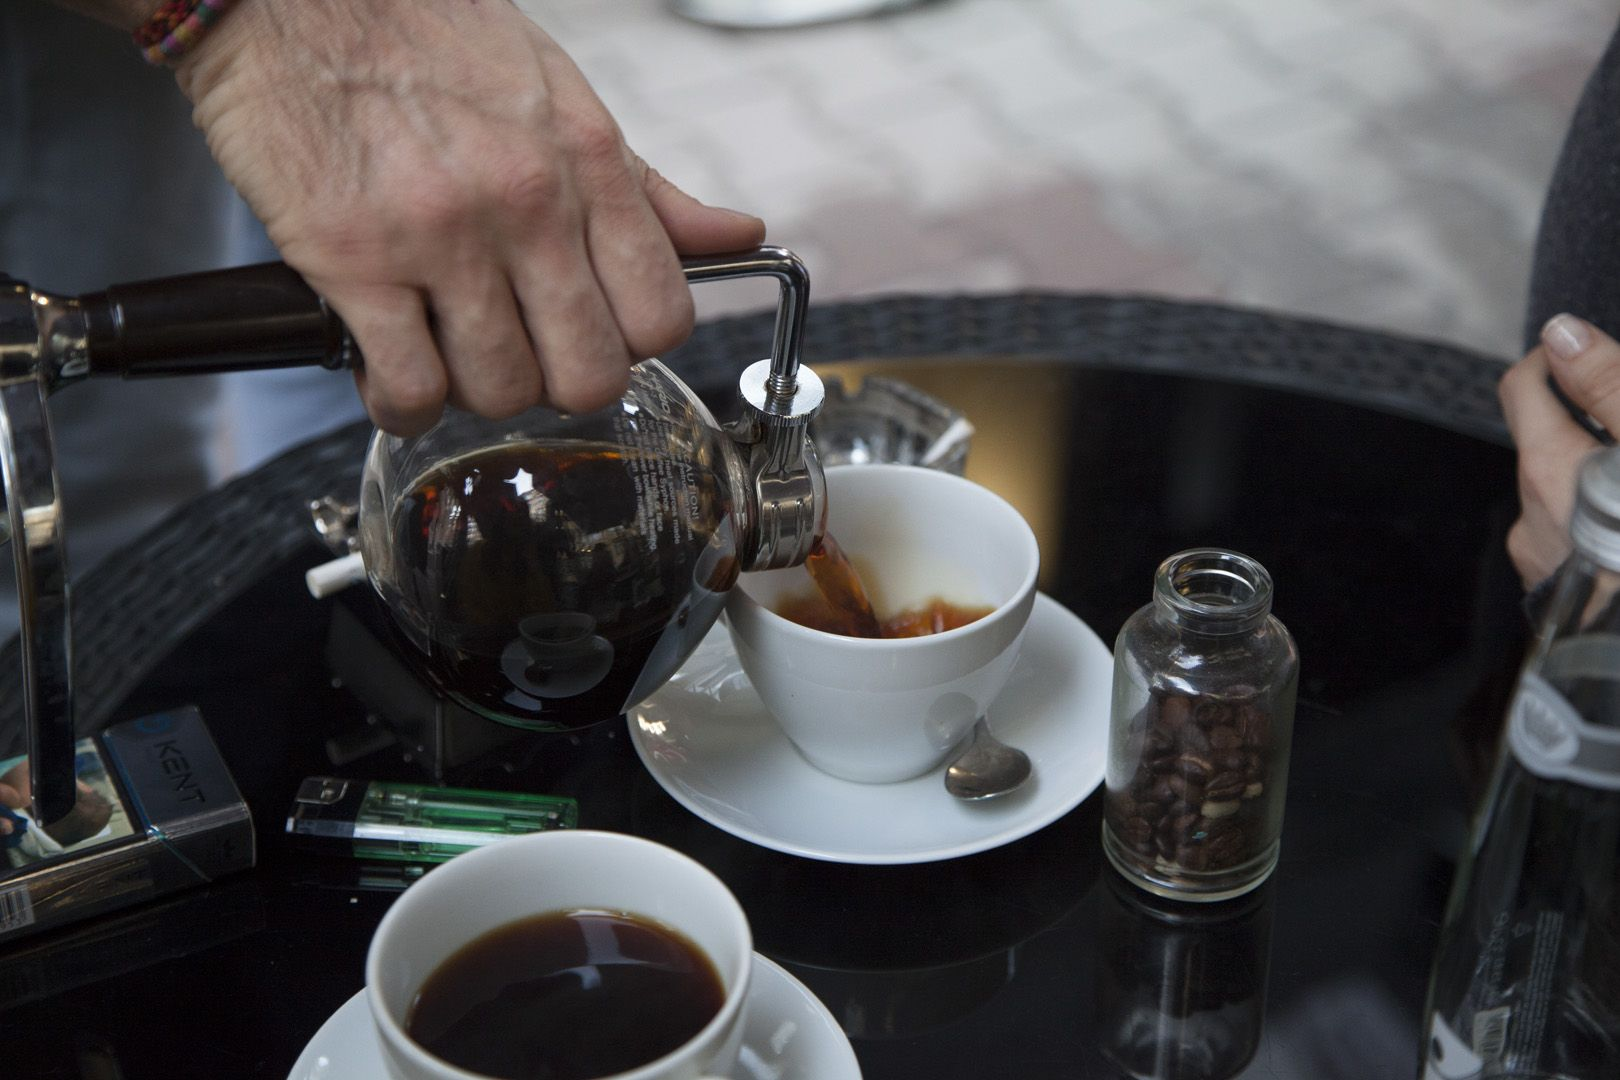 MOC Istanbul - Vesta Event - Coffee - 3rd Wave Coffee - Istanbul - Espresso - Barista - Coffee Shop - Coffee Bean - Latte Art - Syphon